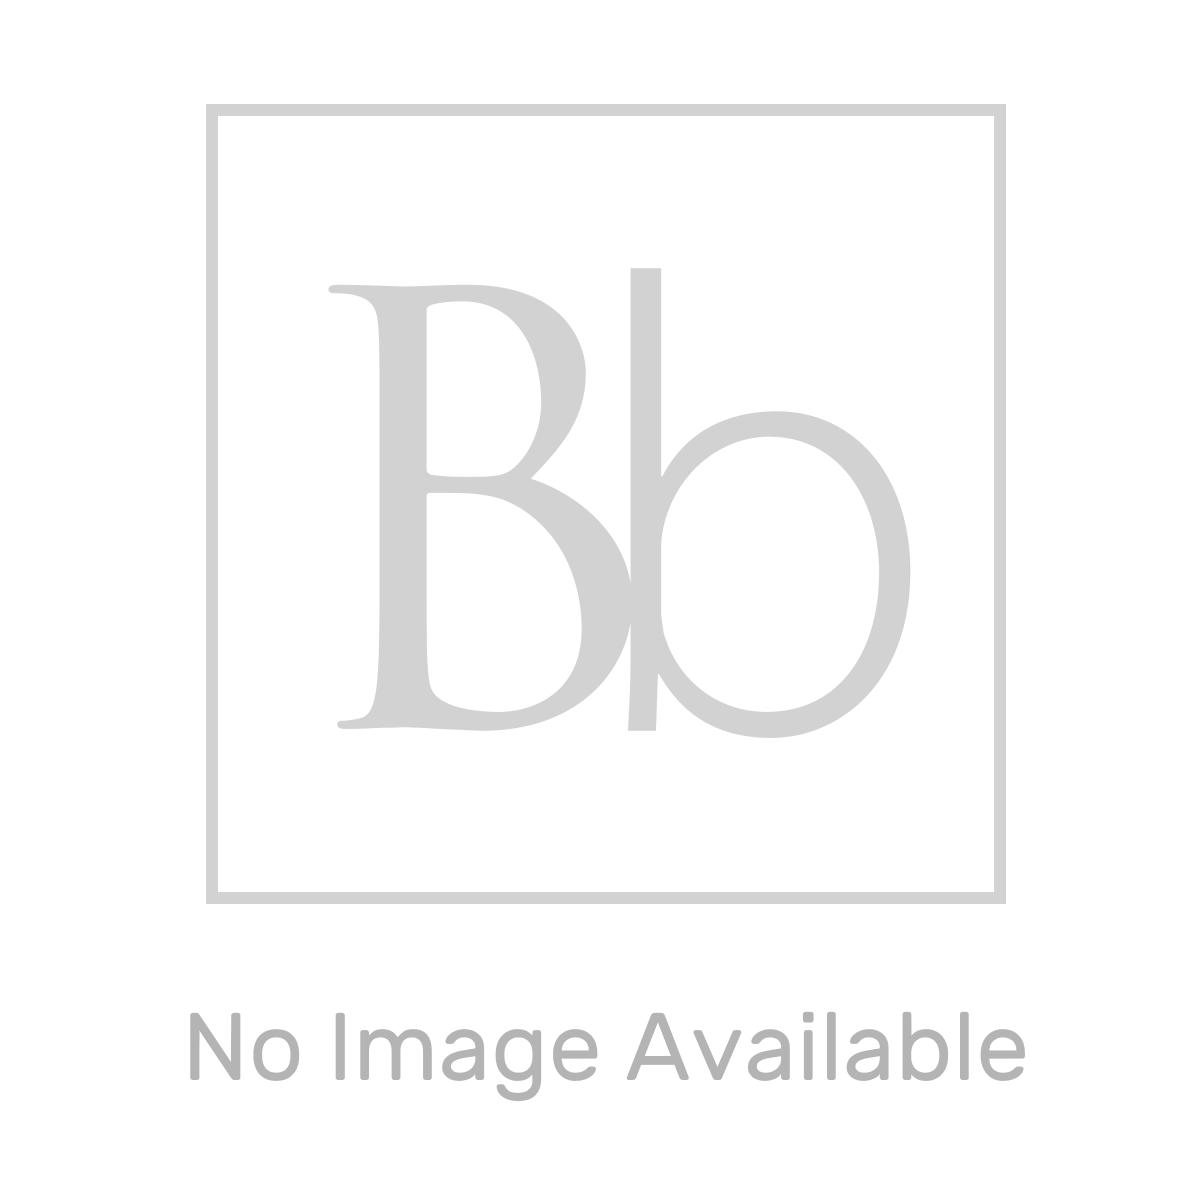 RAK Surface Cool Grey Lappato Tile 750 x 750mm Lifestyle